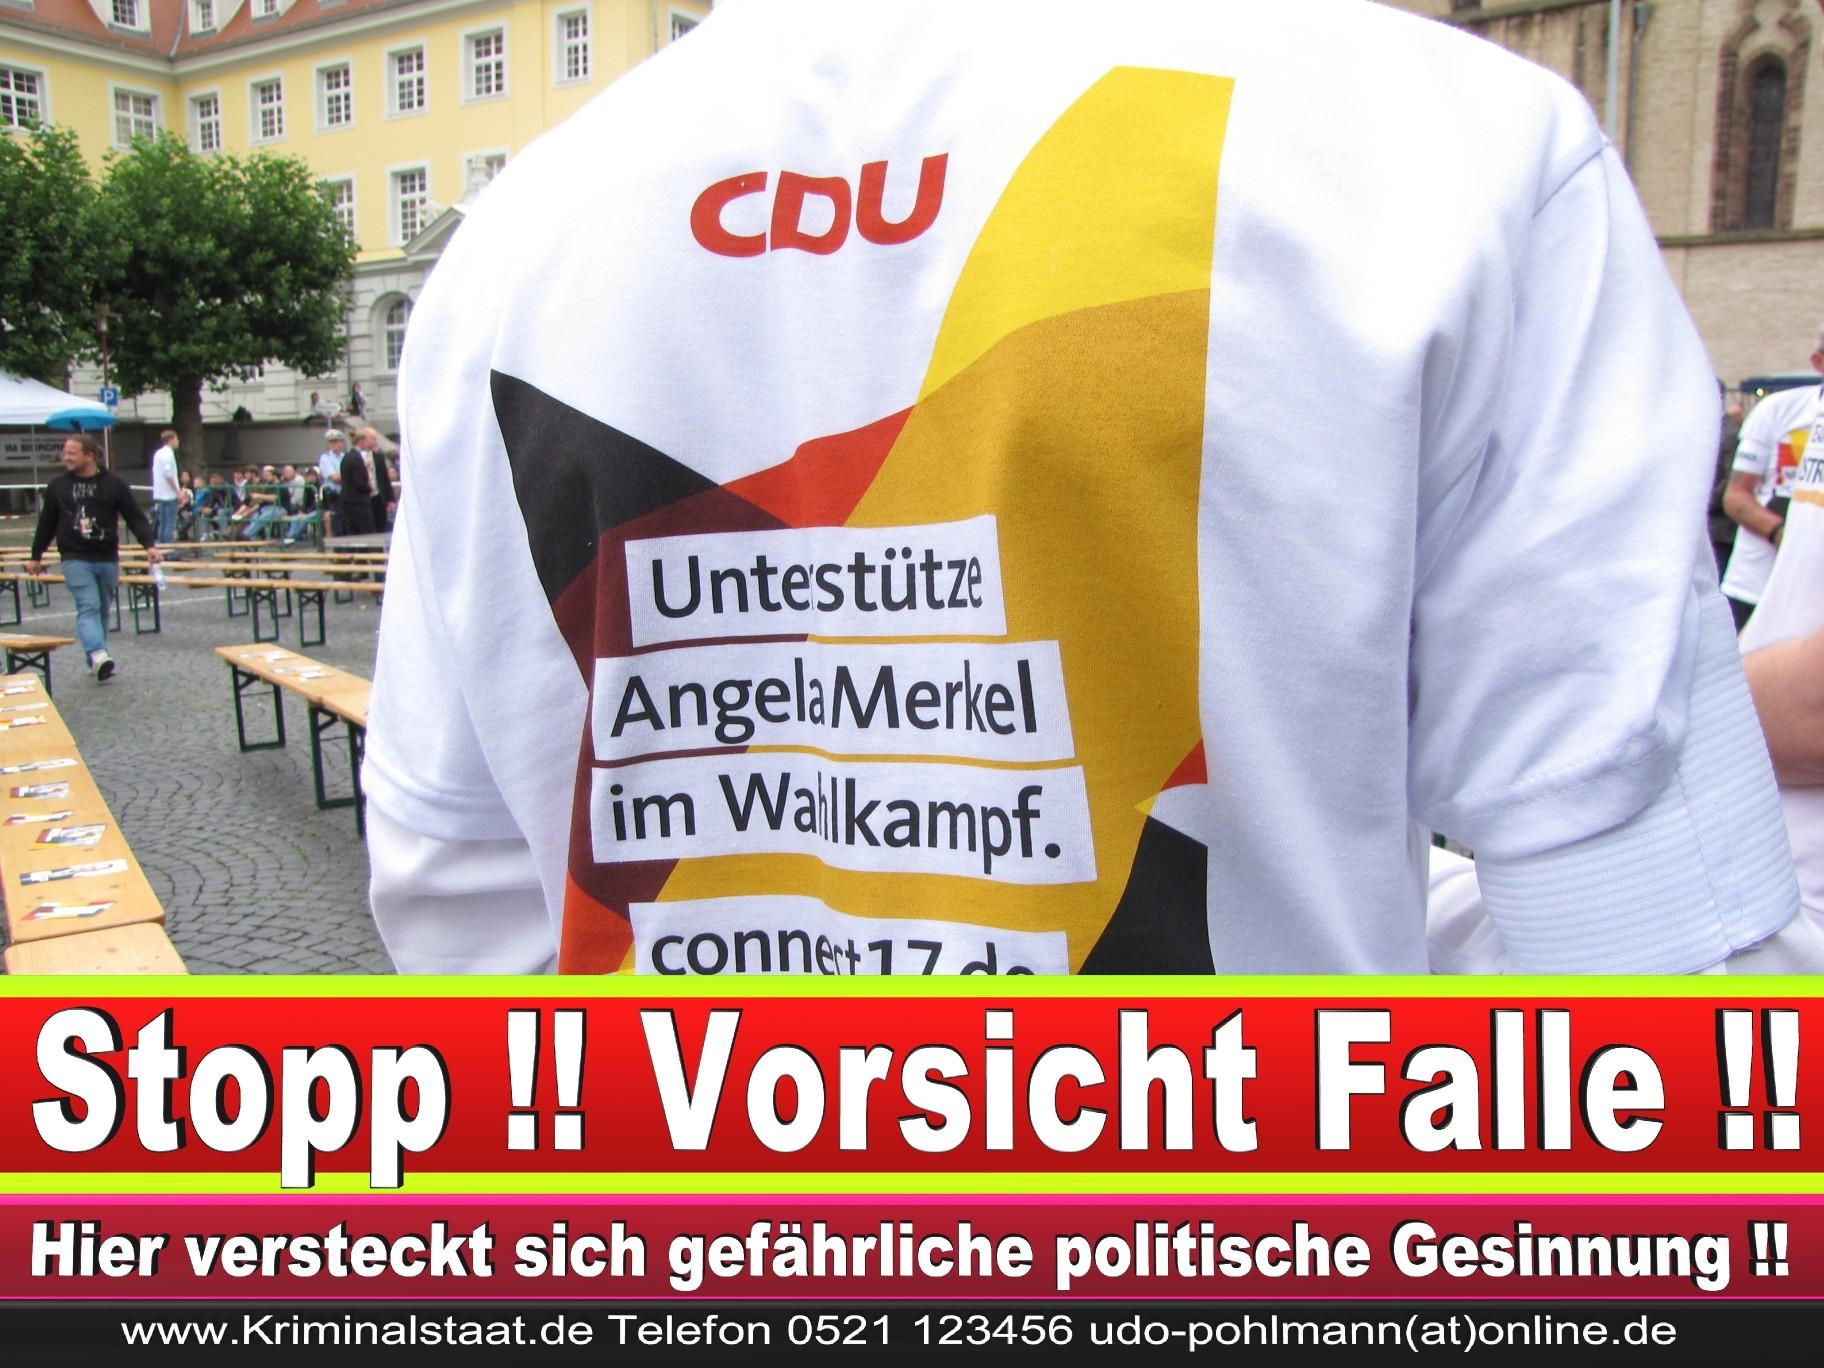 CDU HERFORD Kurruption Betrug Kinderpornografie Kinderpornos 11